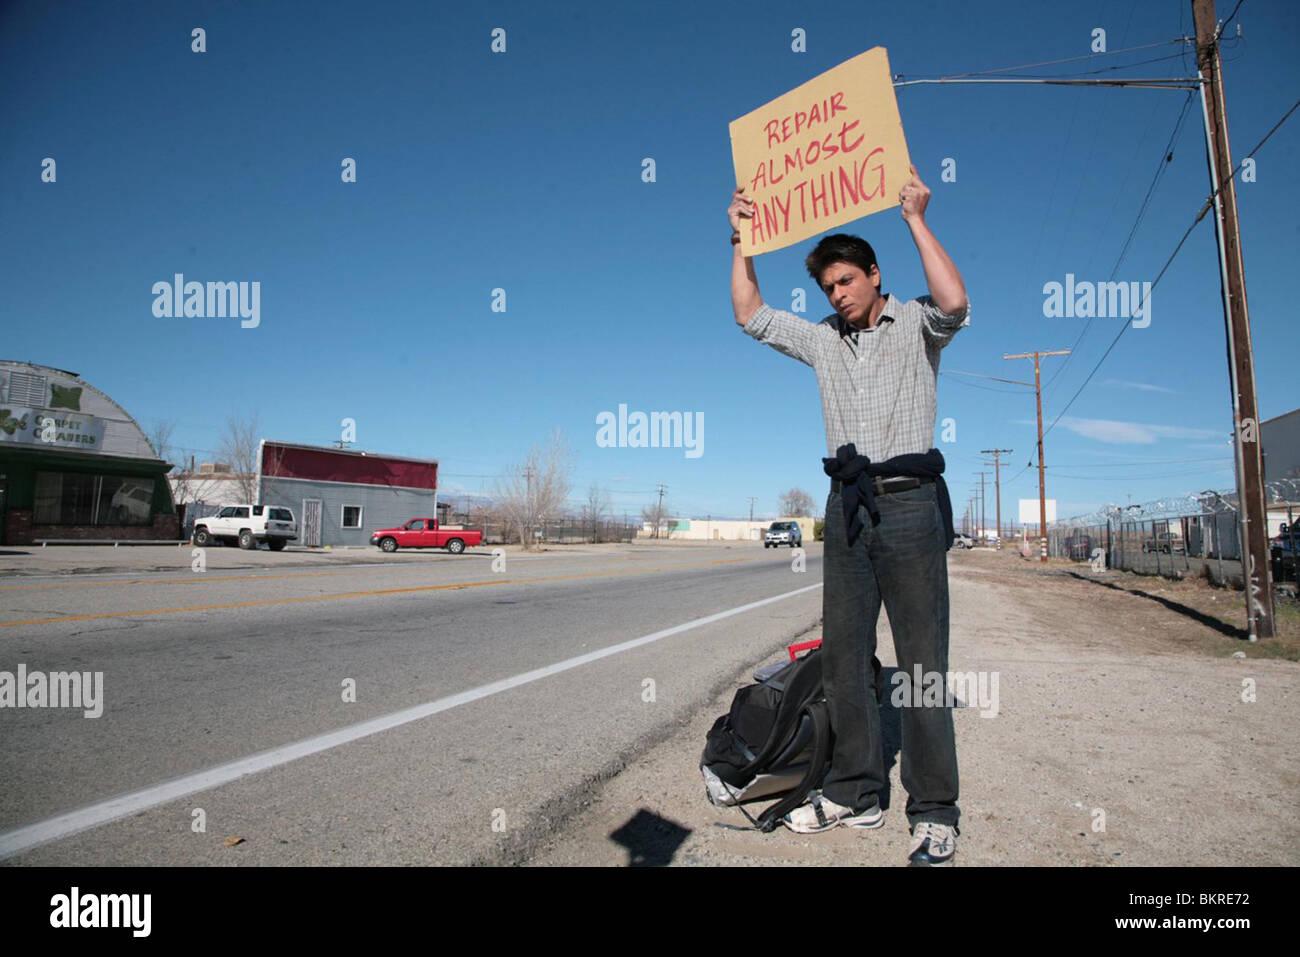 Shahrukh Khan Stock Photos & Shahrukh Khan Stock Images - Alamy